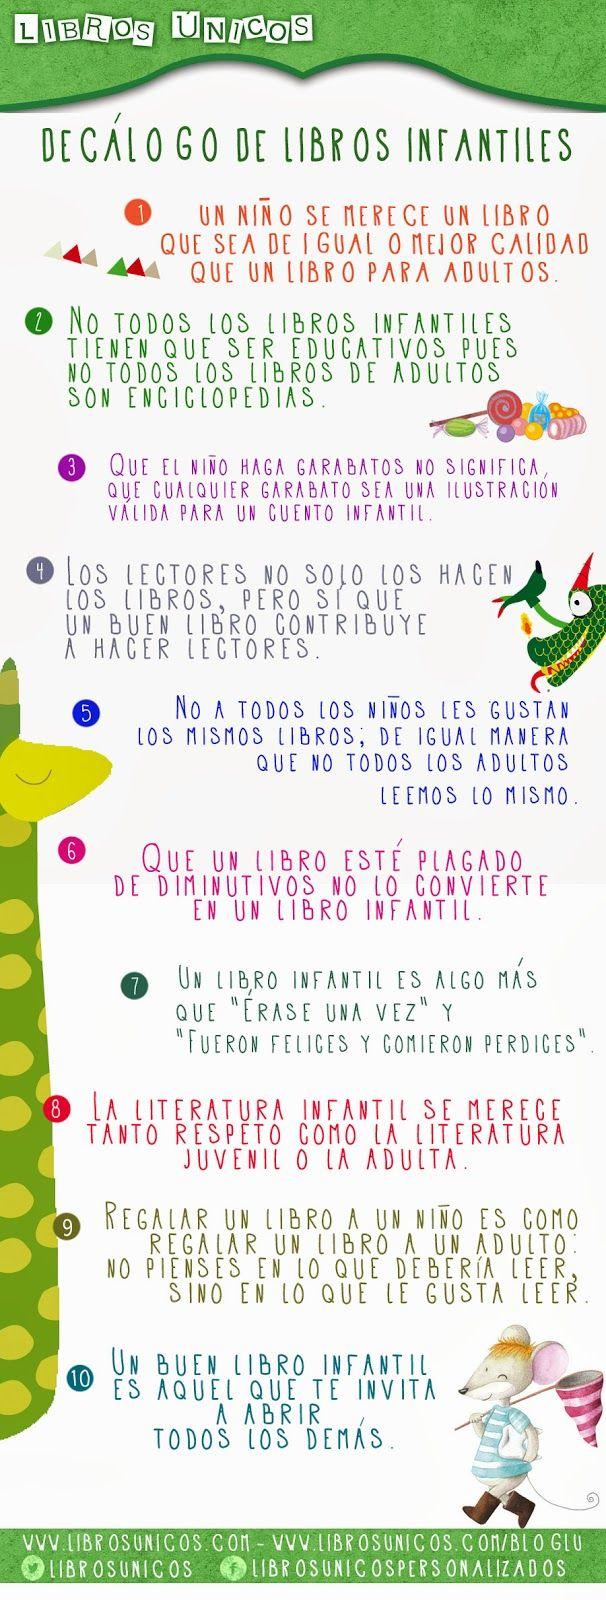 DECÁLOGO DE LIBROS INFANTILES. - soñando cuentos